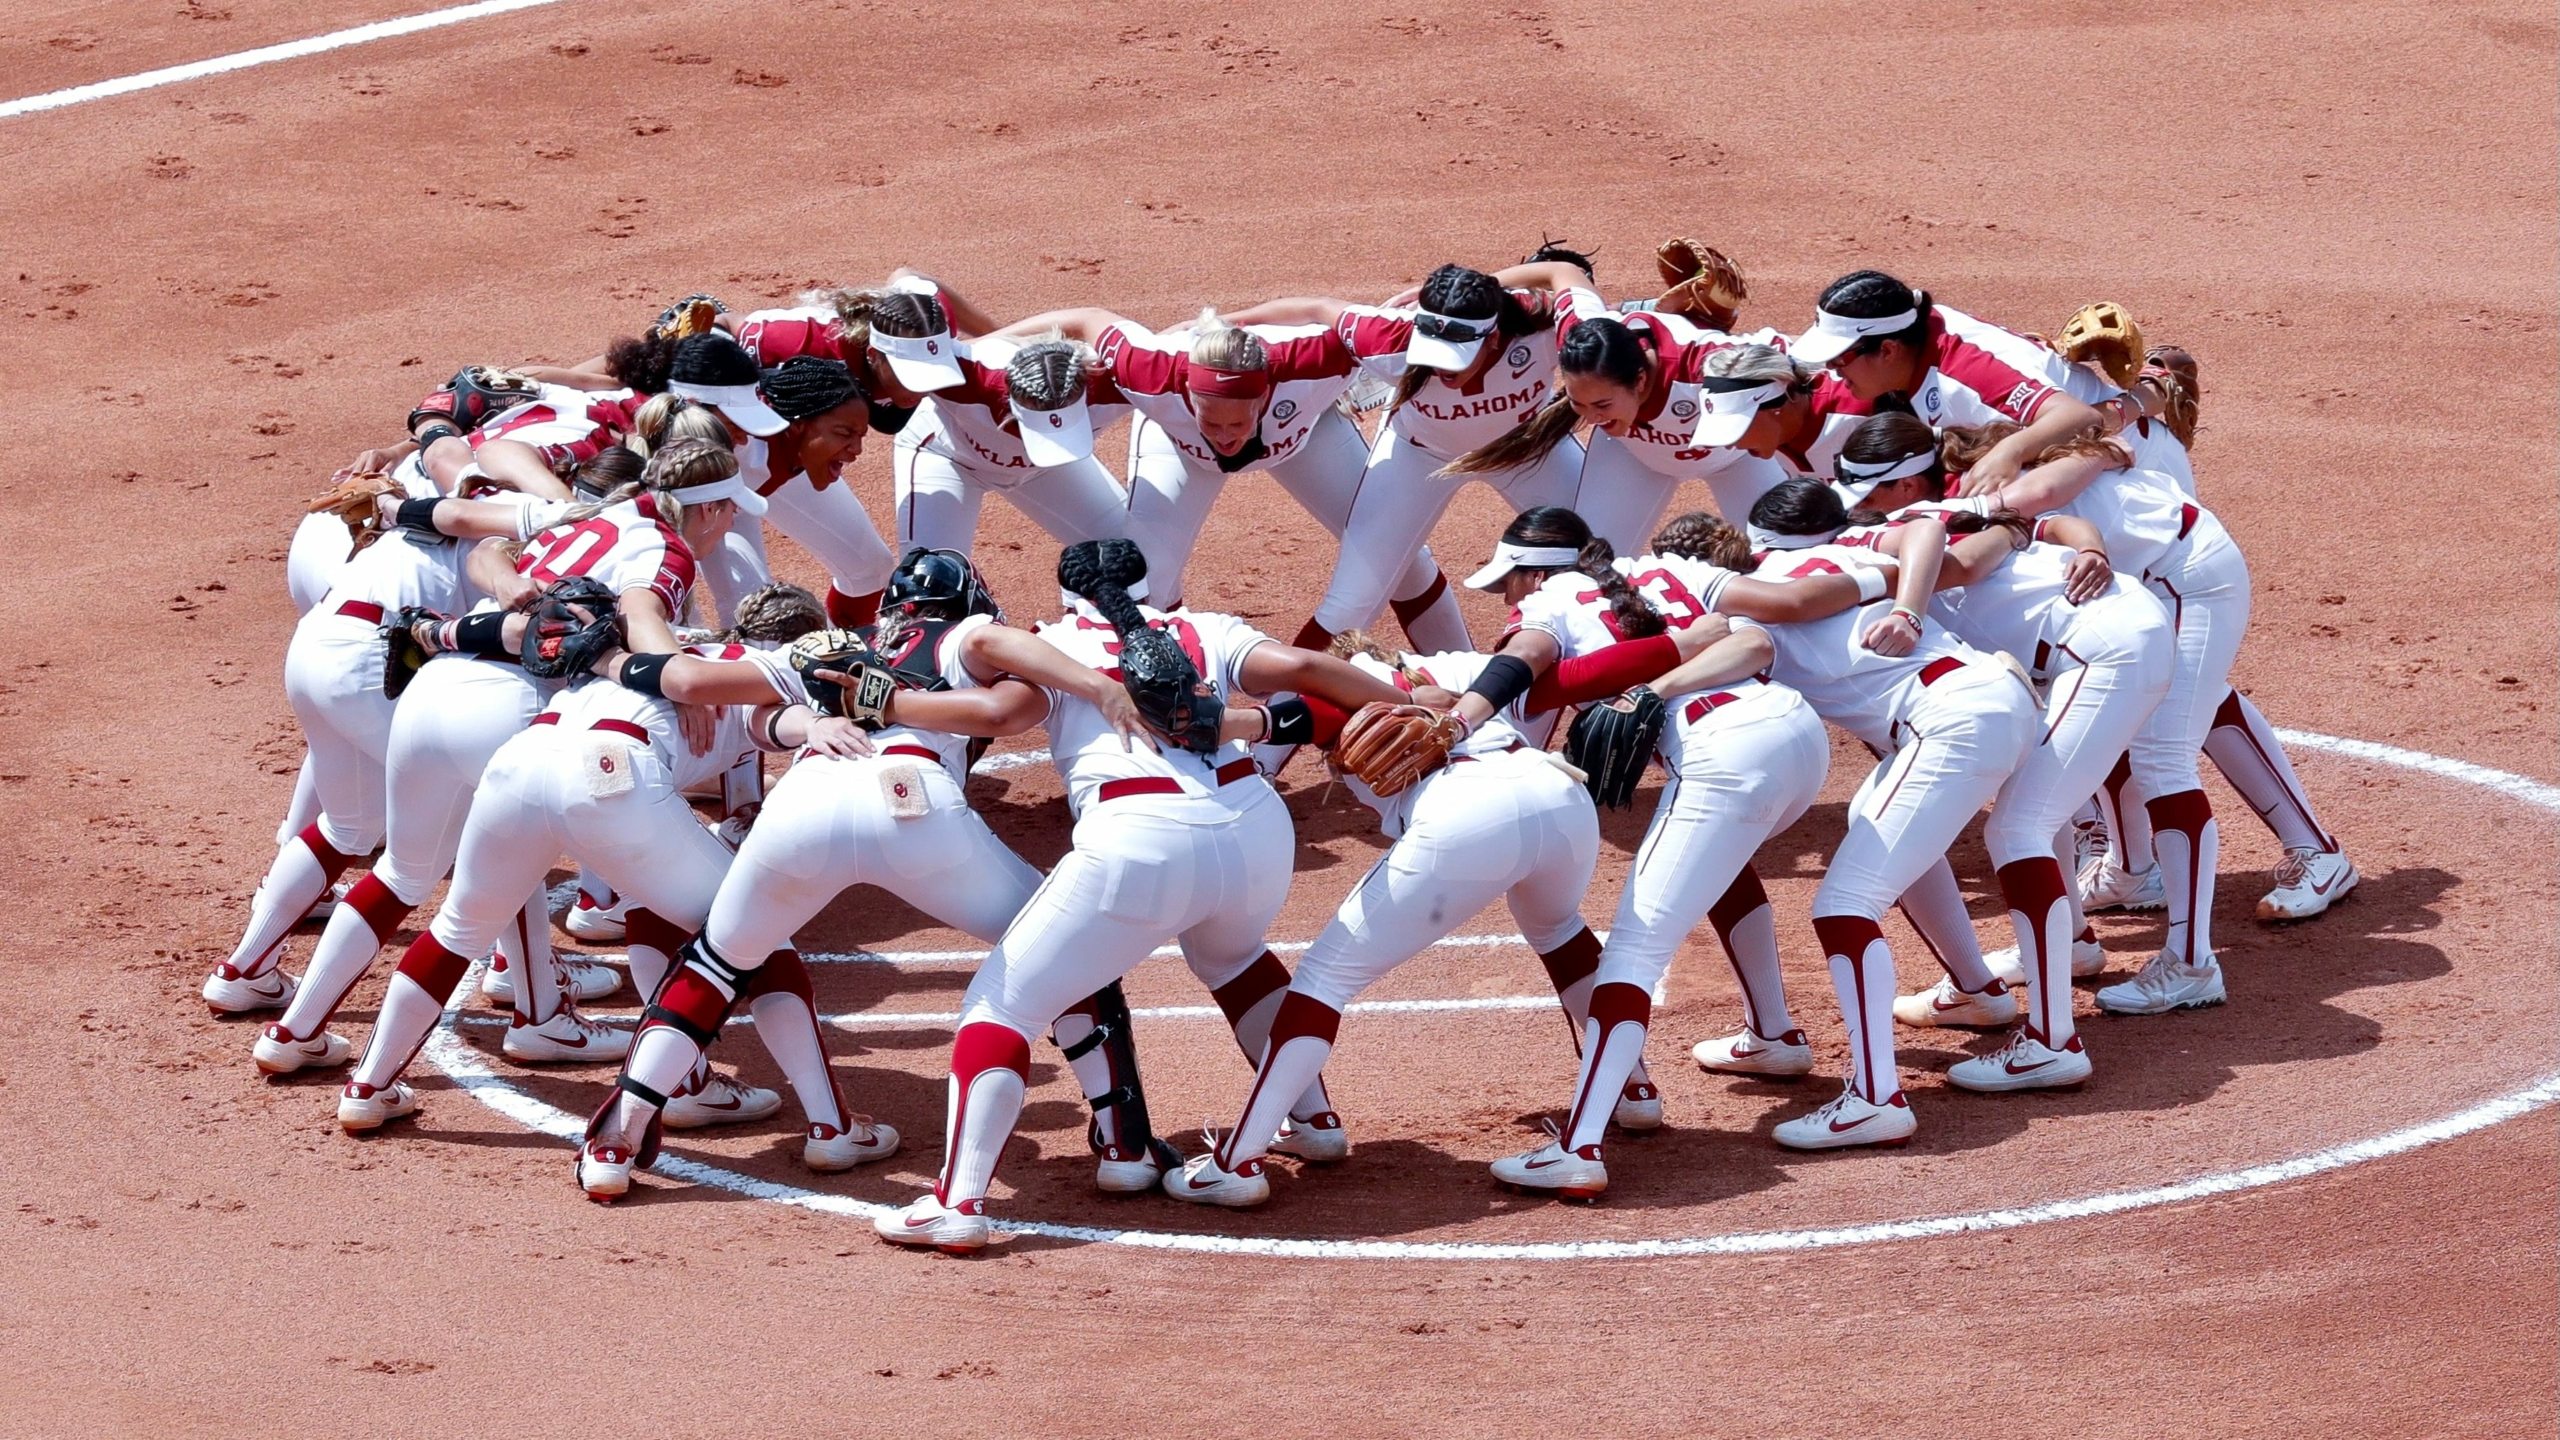 Oklahoma Softball team in a huddle